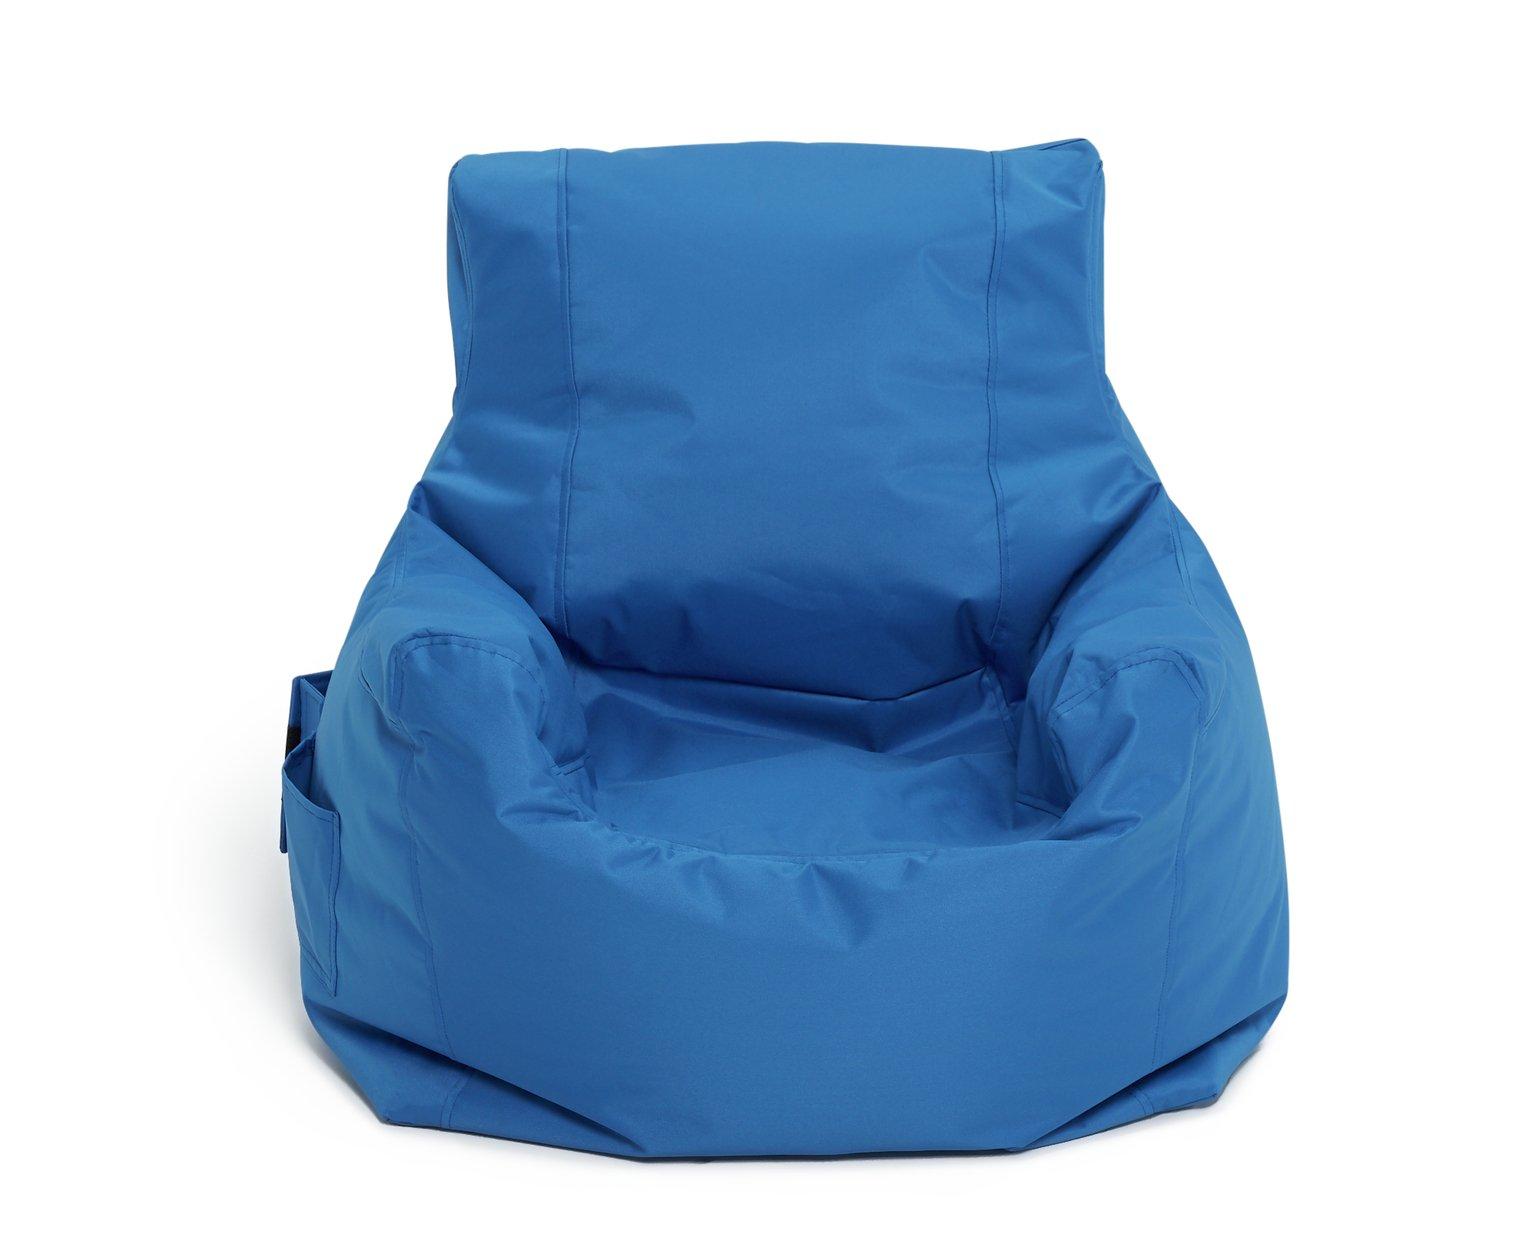 bean bag gaming chair argos office master chairs buy home teenager beanbag blue beanbags